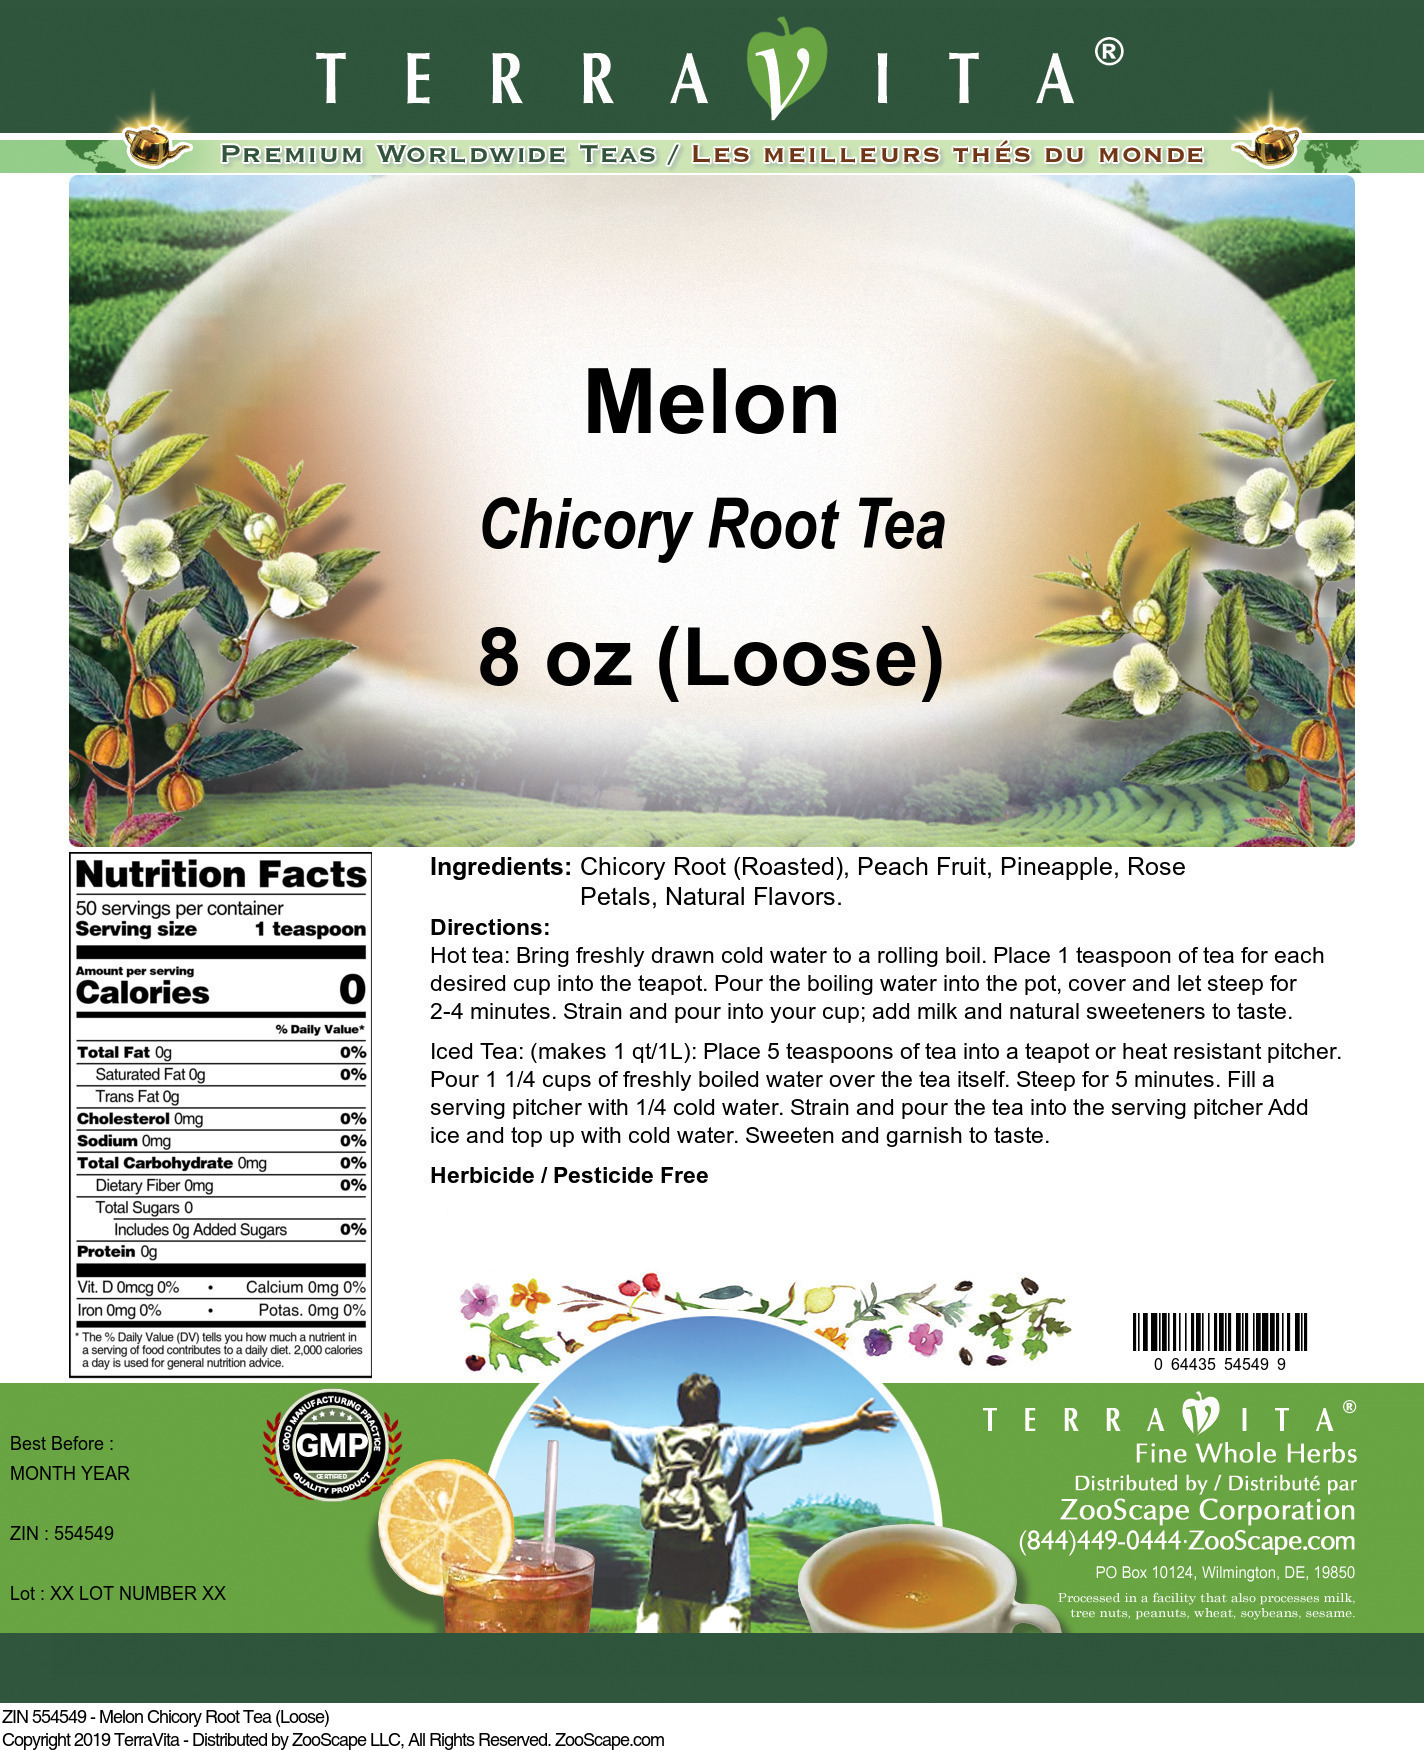 Melon Chicory Root